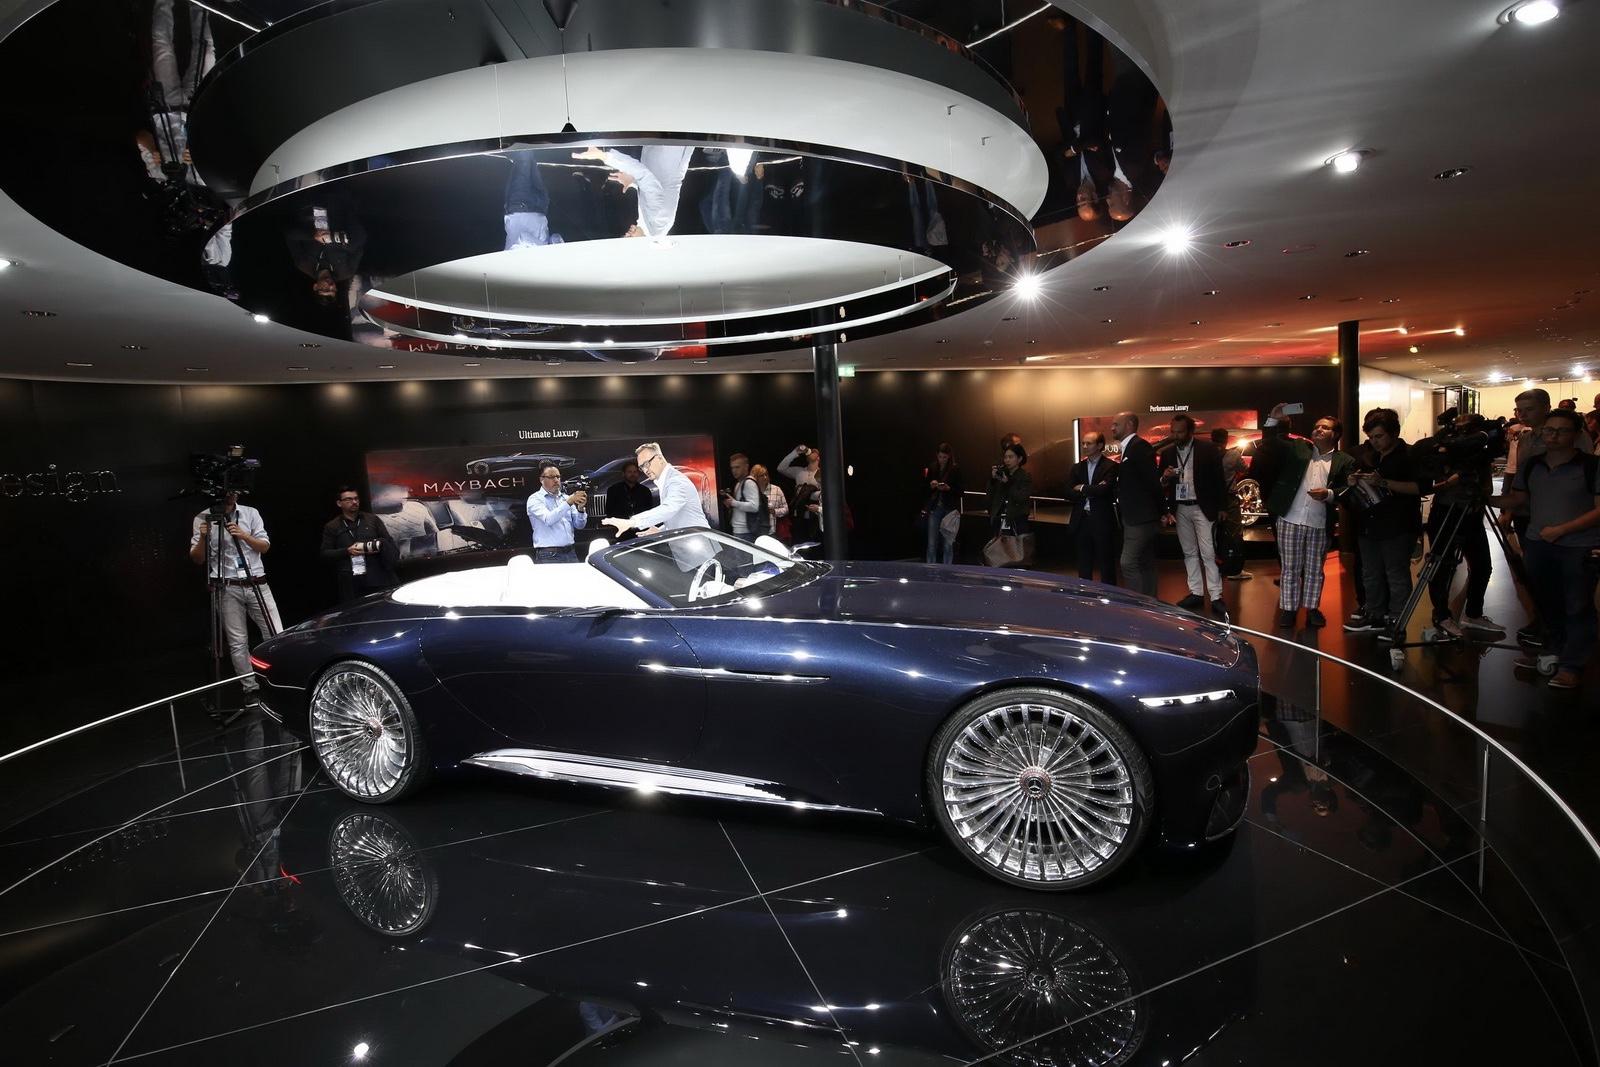 Mercedes-Maybach shows-off at the Frankfurt Motor Show 1